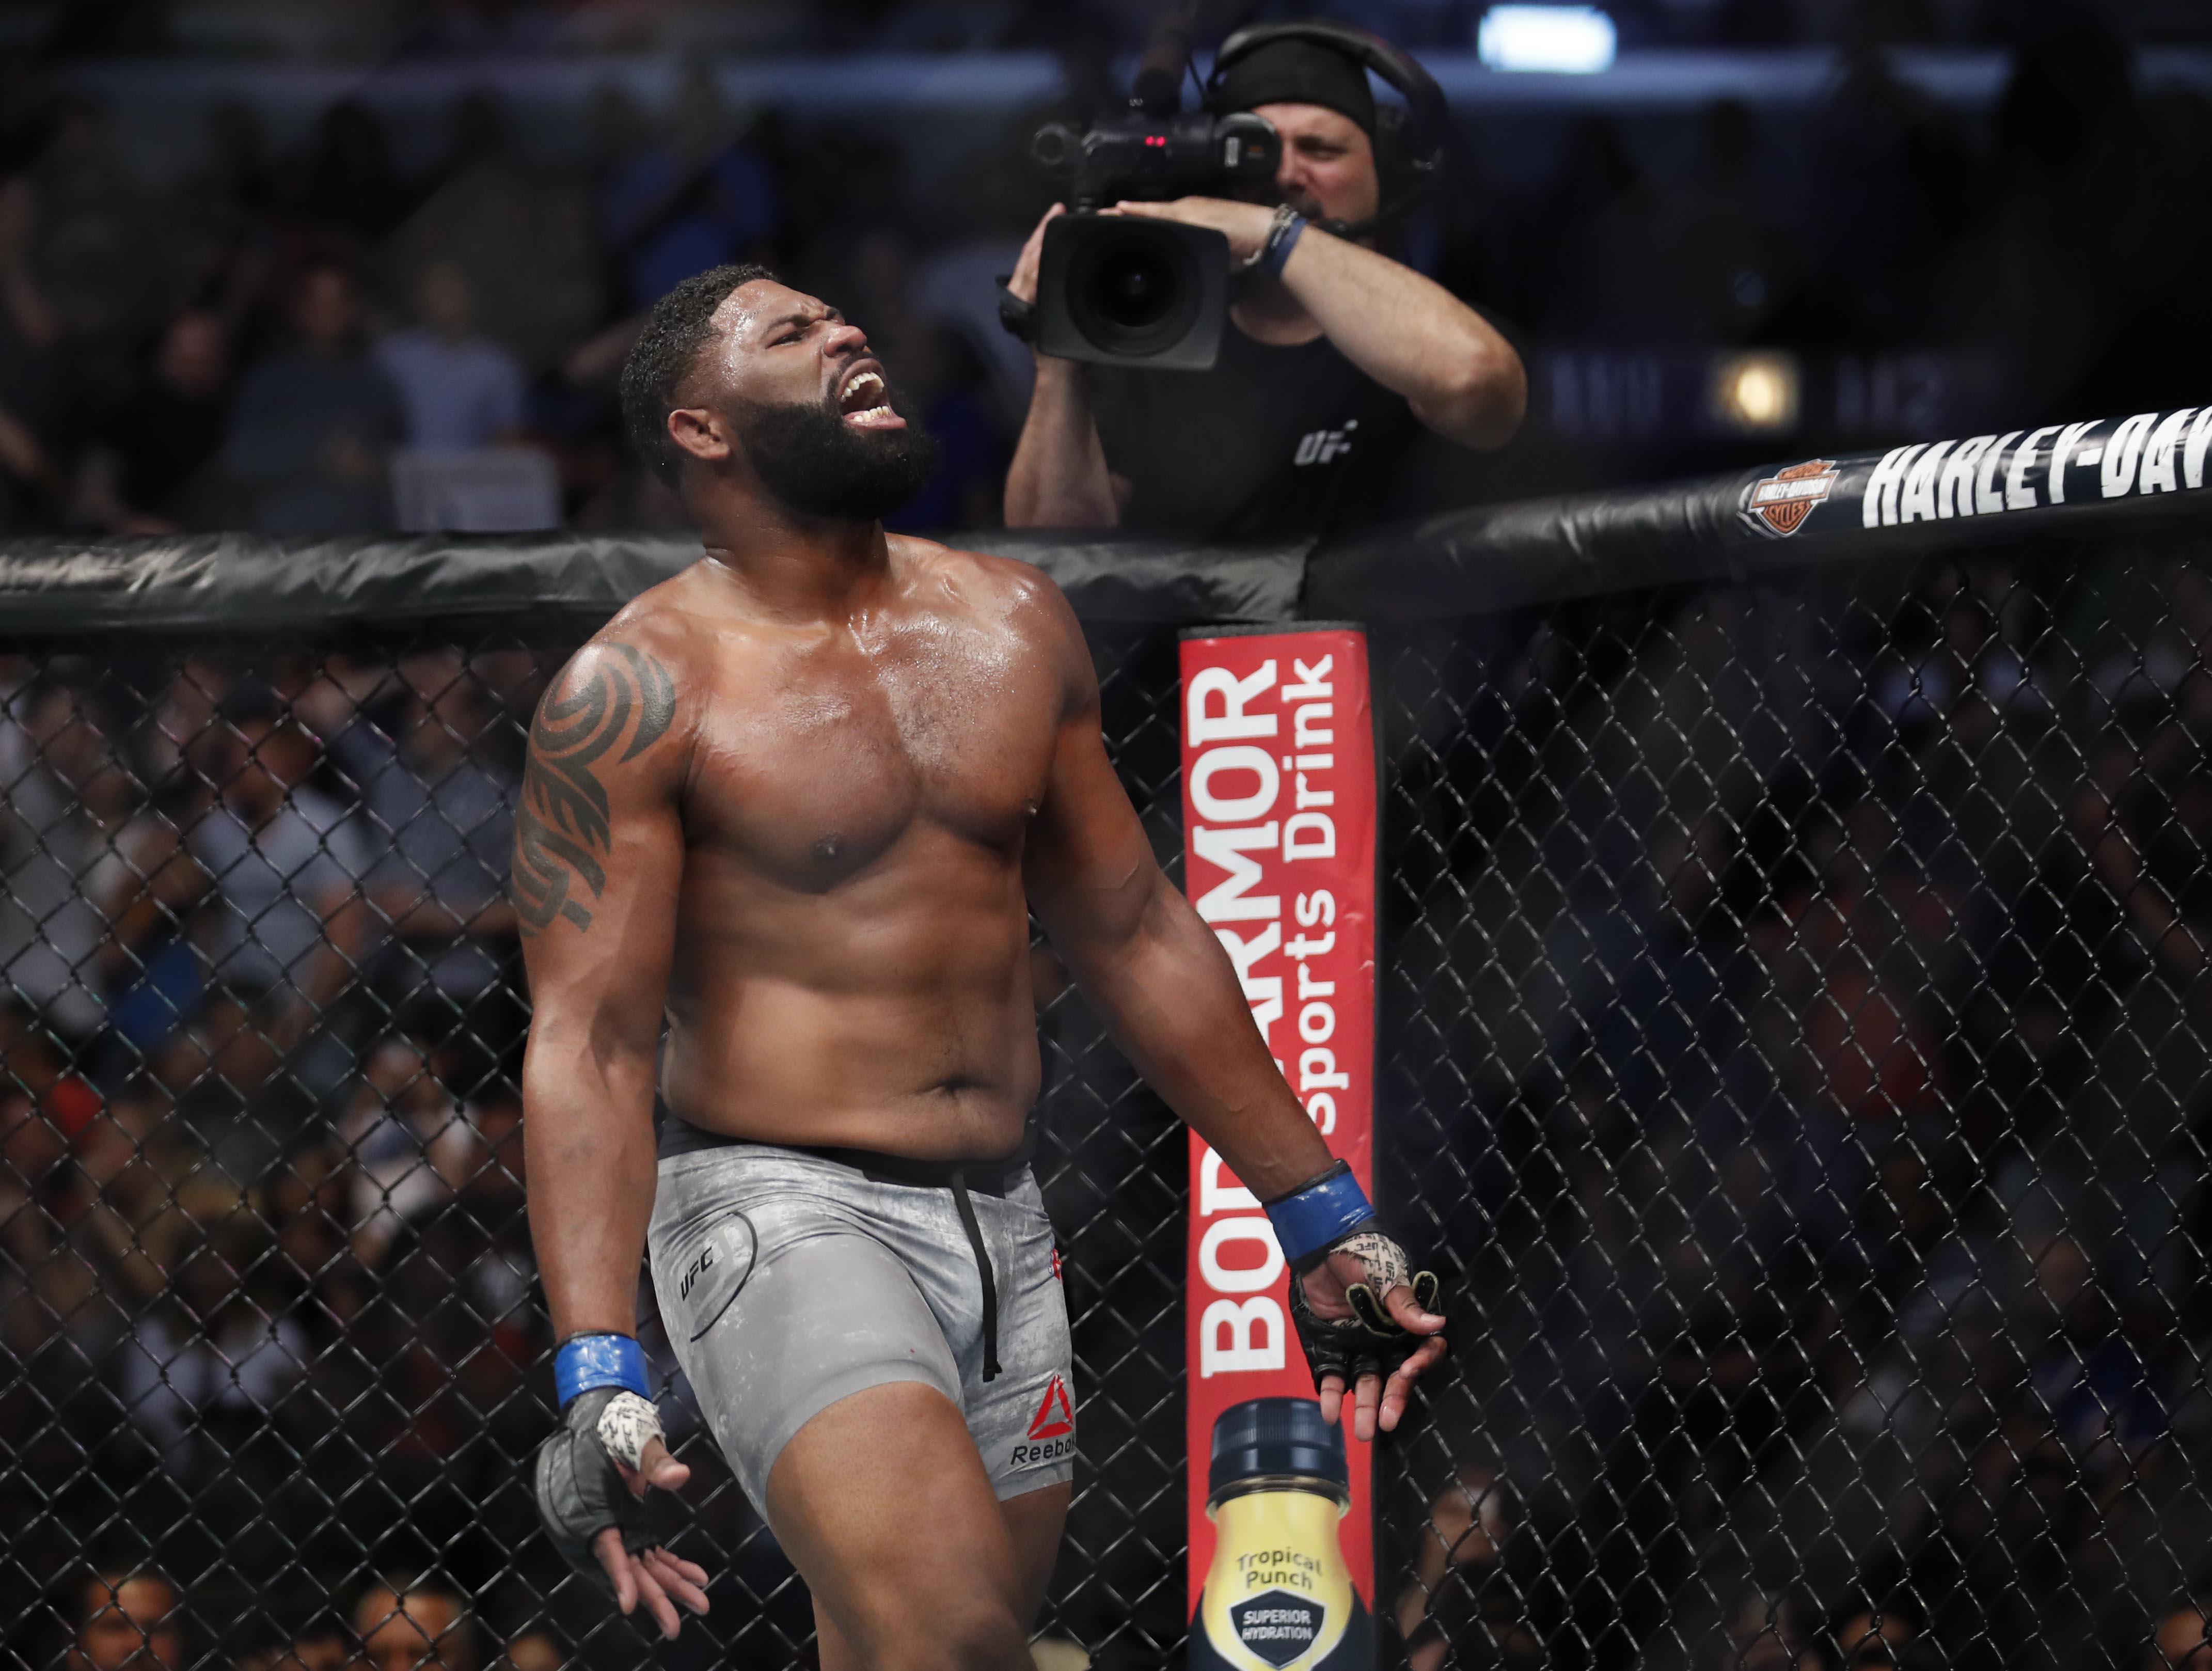 MMA: UFC 225-Overeem vs Blaydes